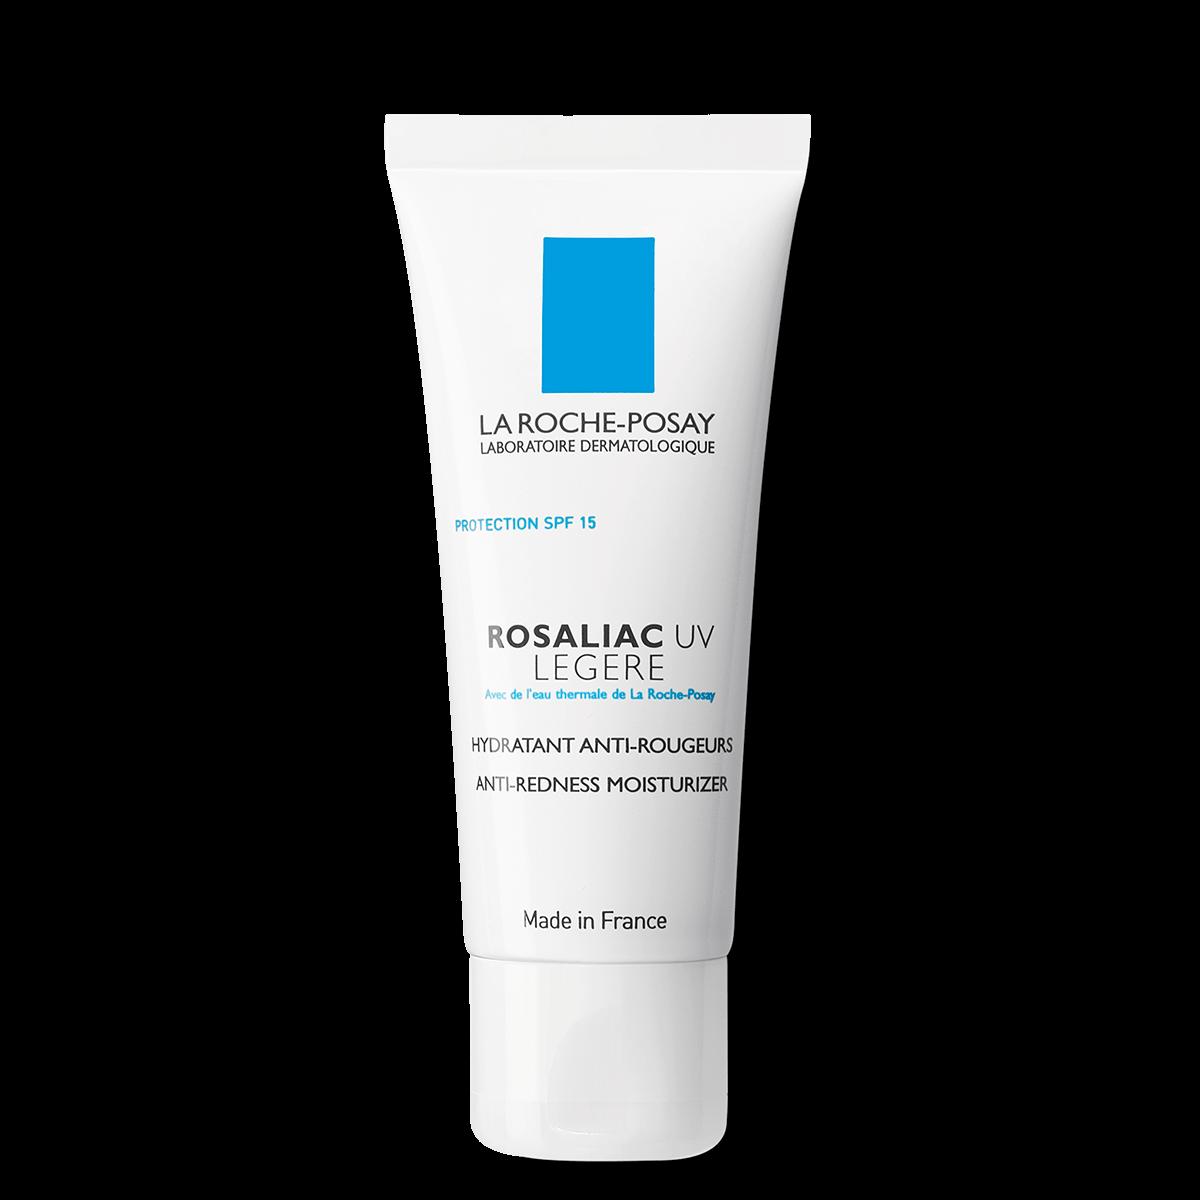 Rosaliac UV Light Spf 15 40 ml Przód | La Roche Posay